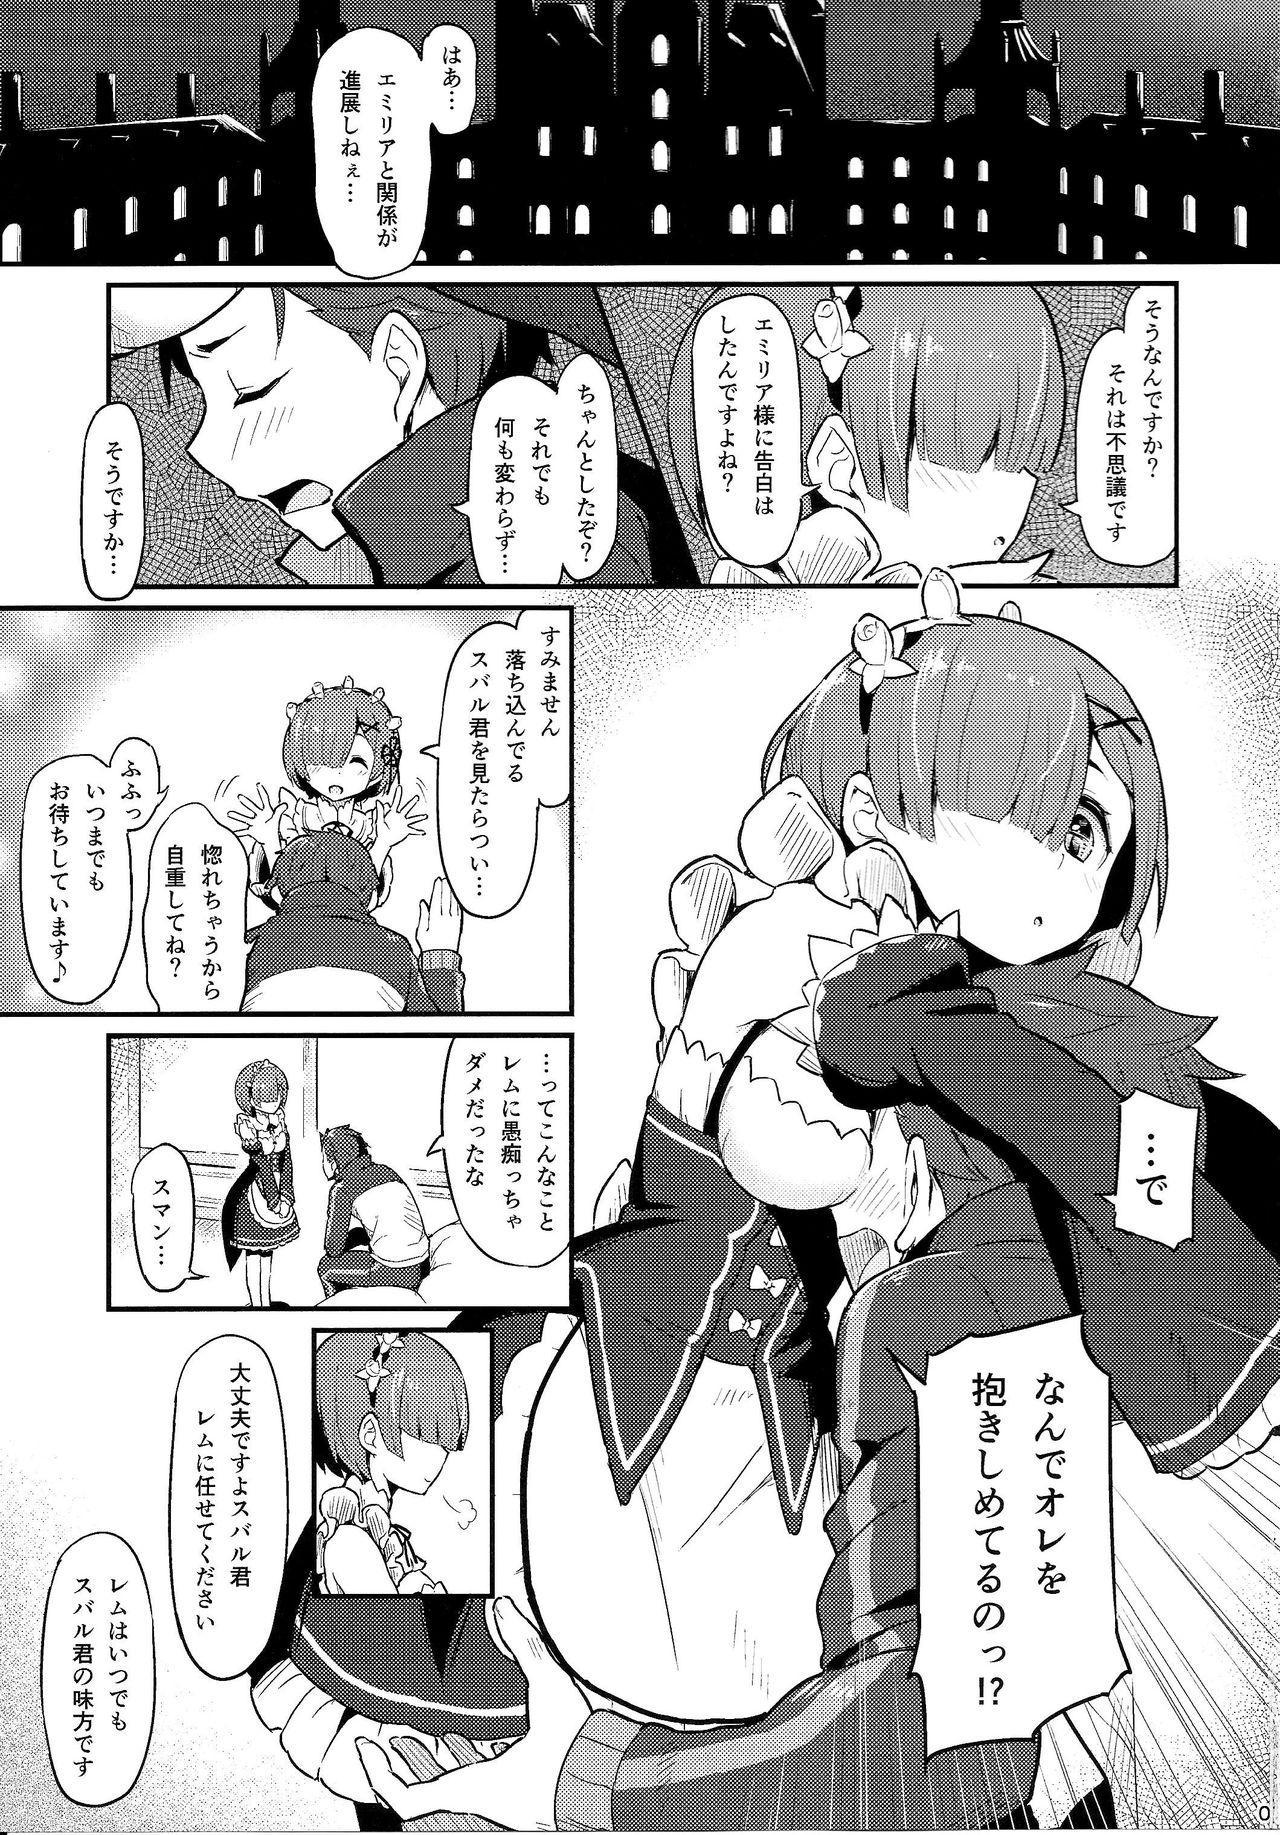 Rem no Emilia Kuttsuke Daisakusen 1